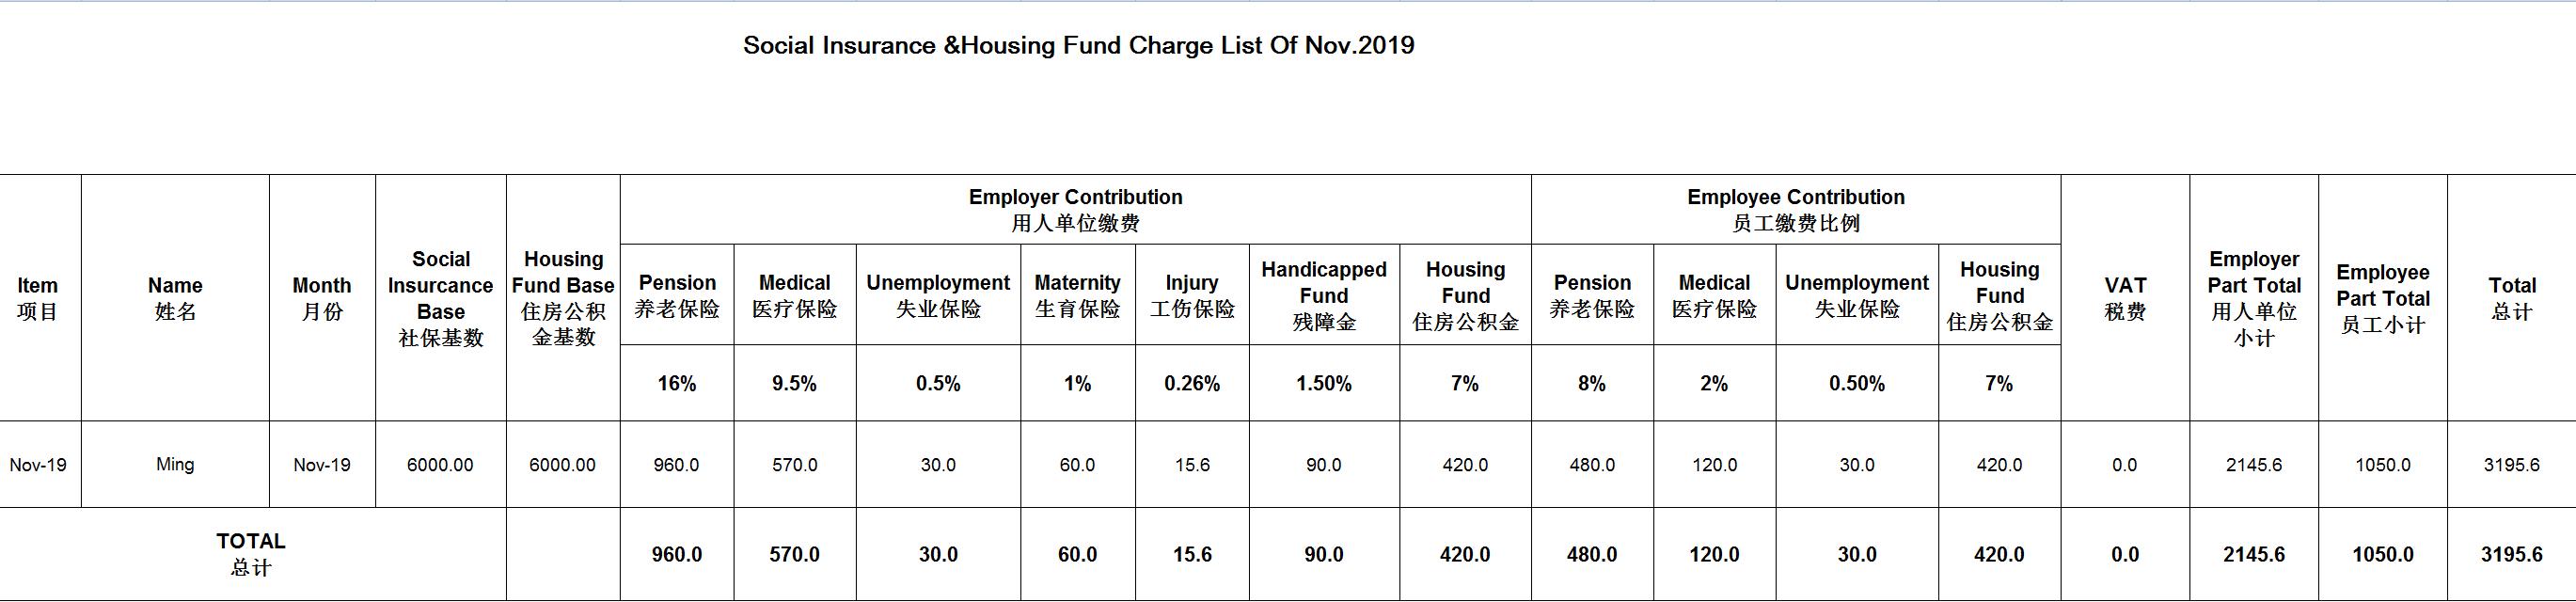 China Insurance &Housing Charge